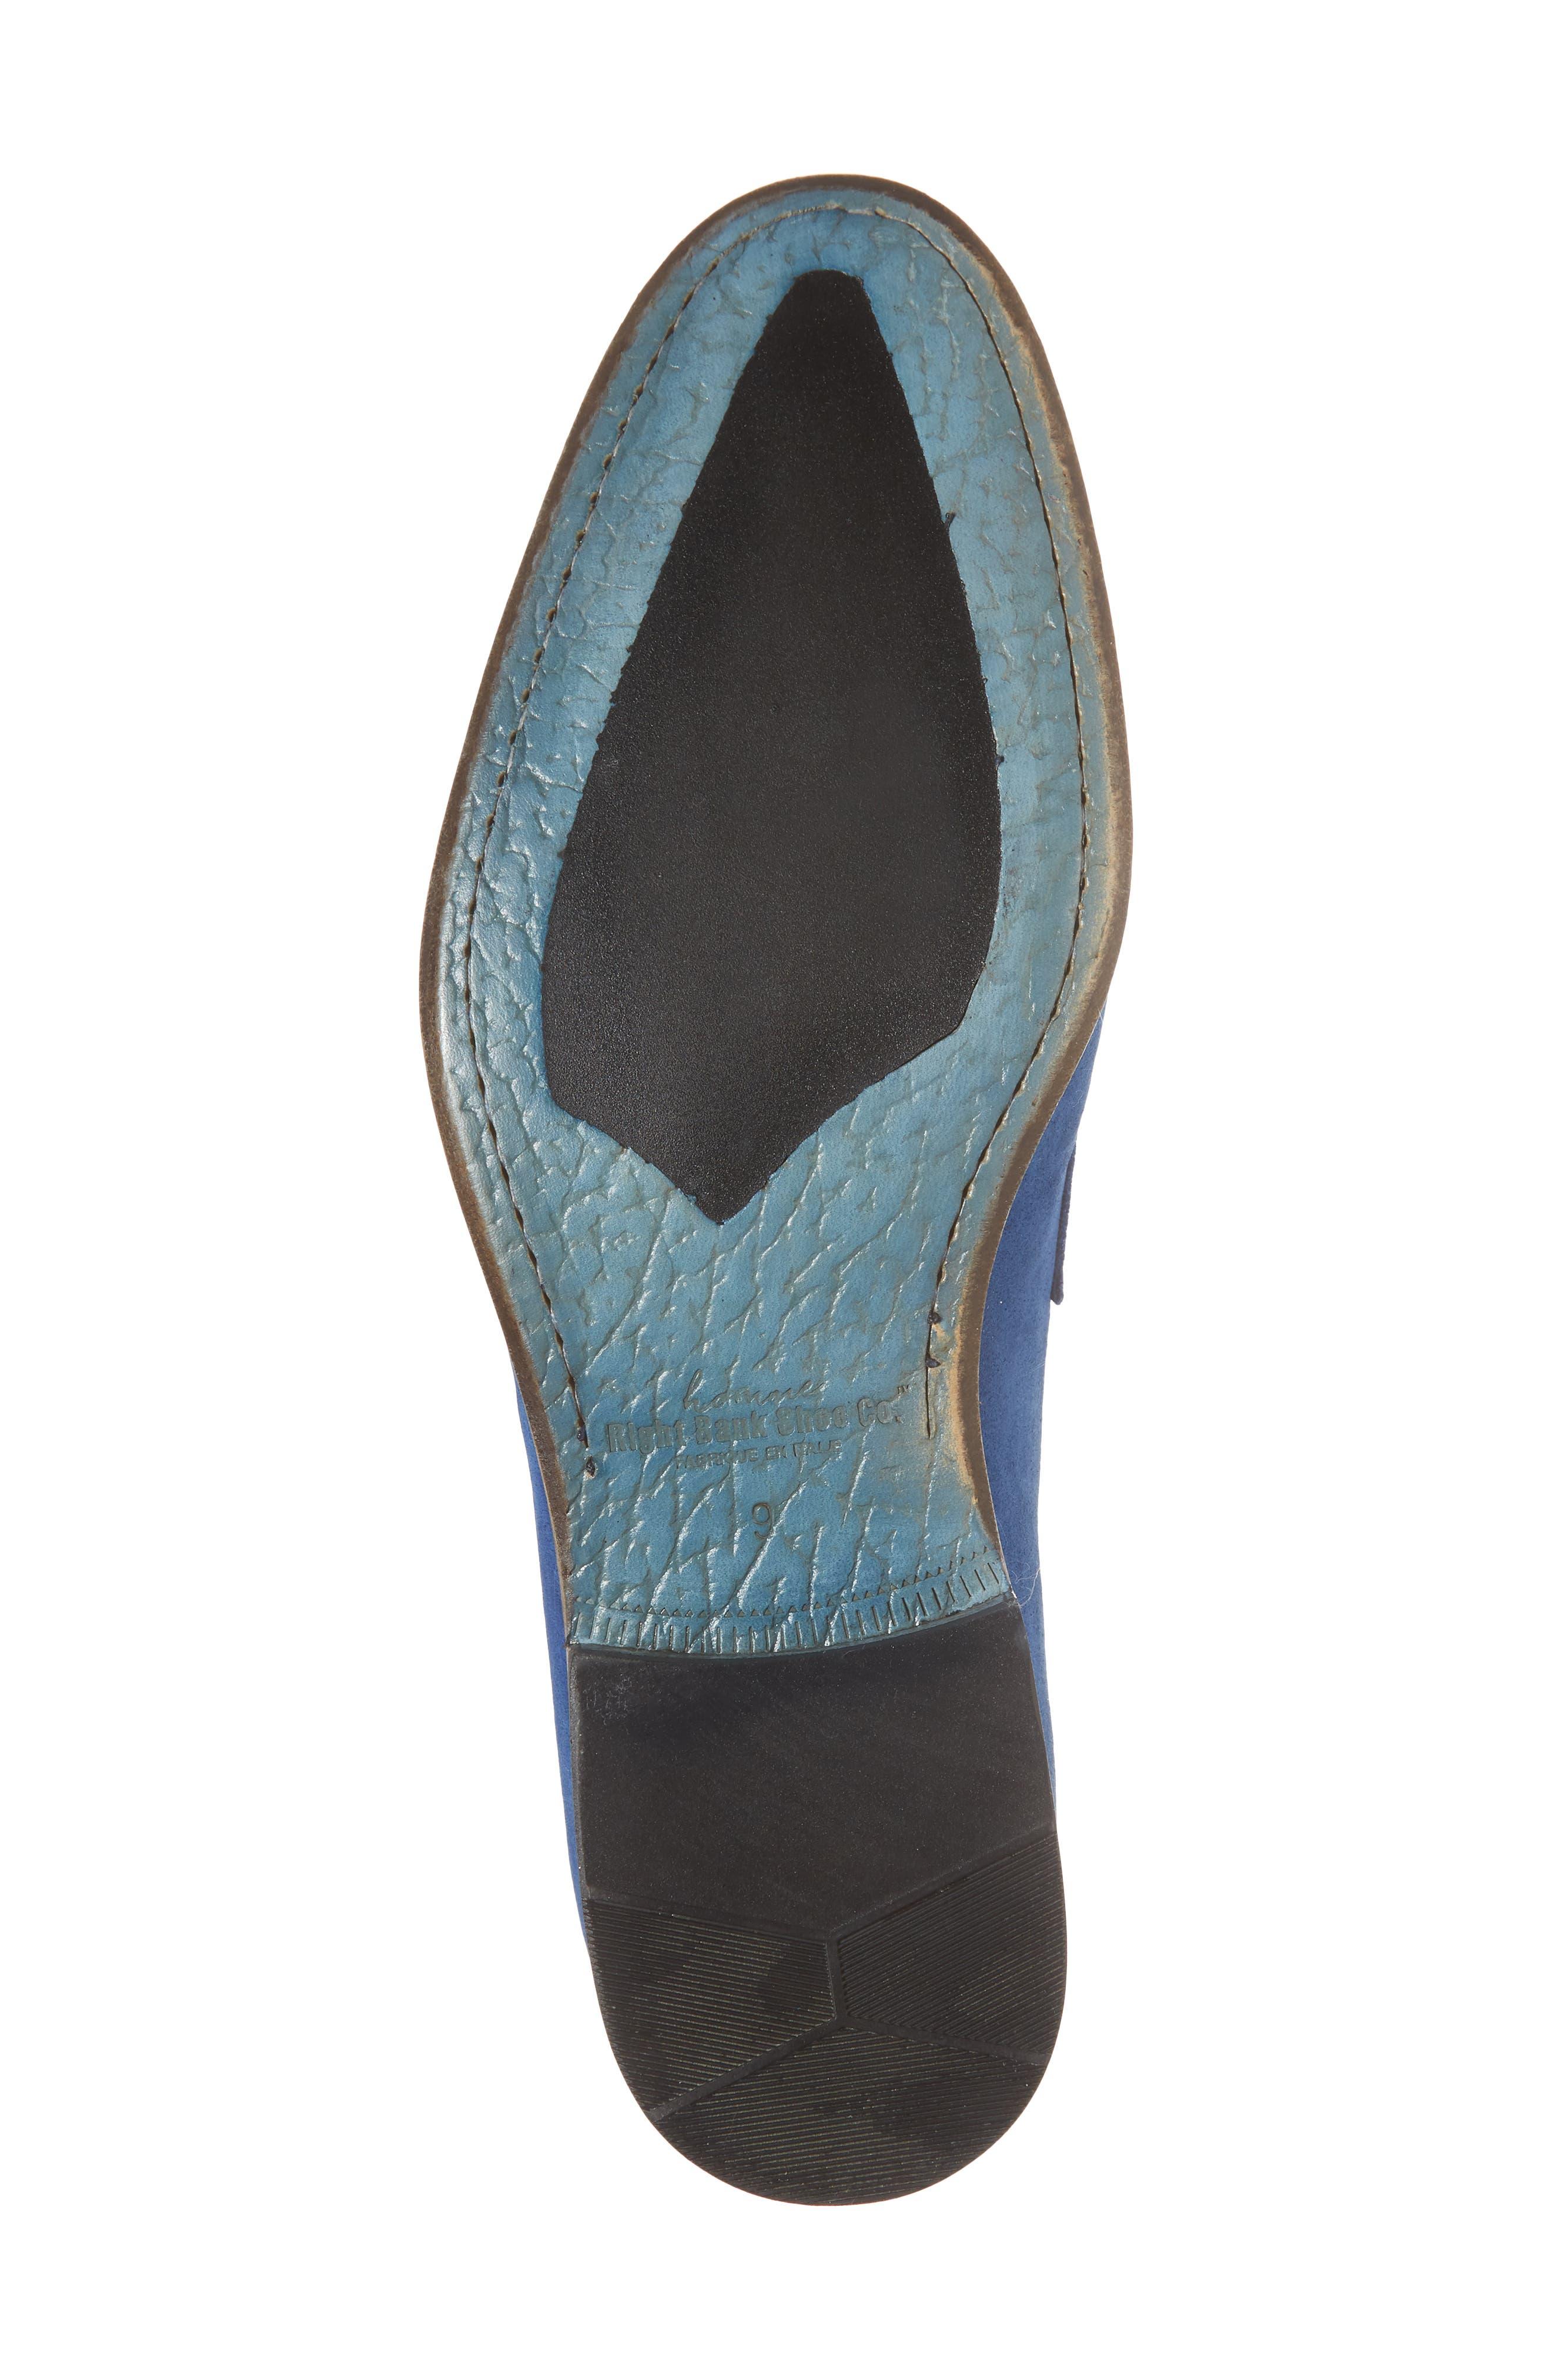 Lex Apron Toe Penny Loafer,                             Alternate thumbnail 6, color,                             Blue Suede